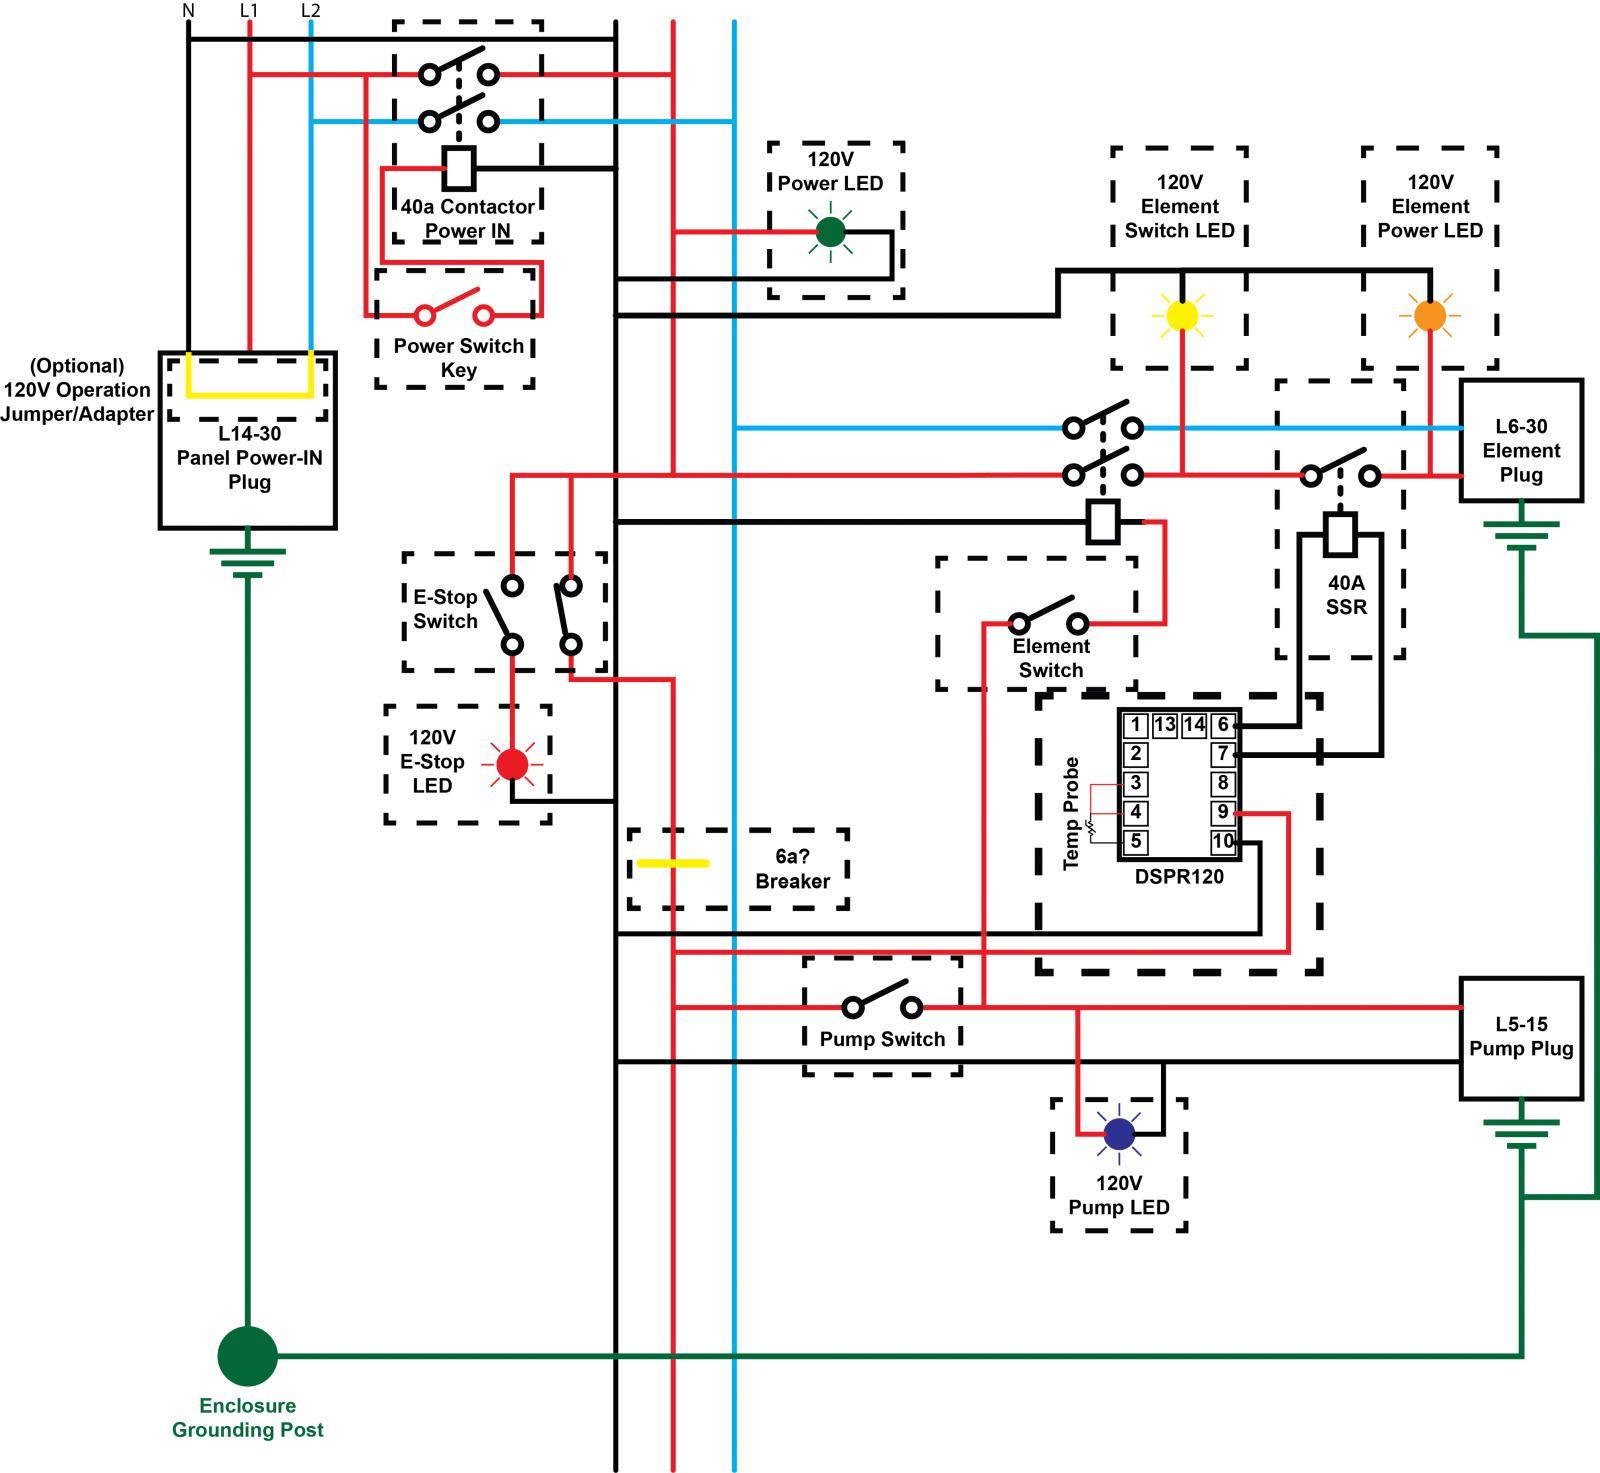 rims single element wiring diagram